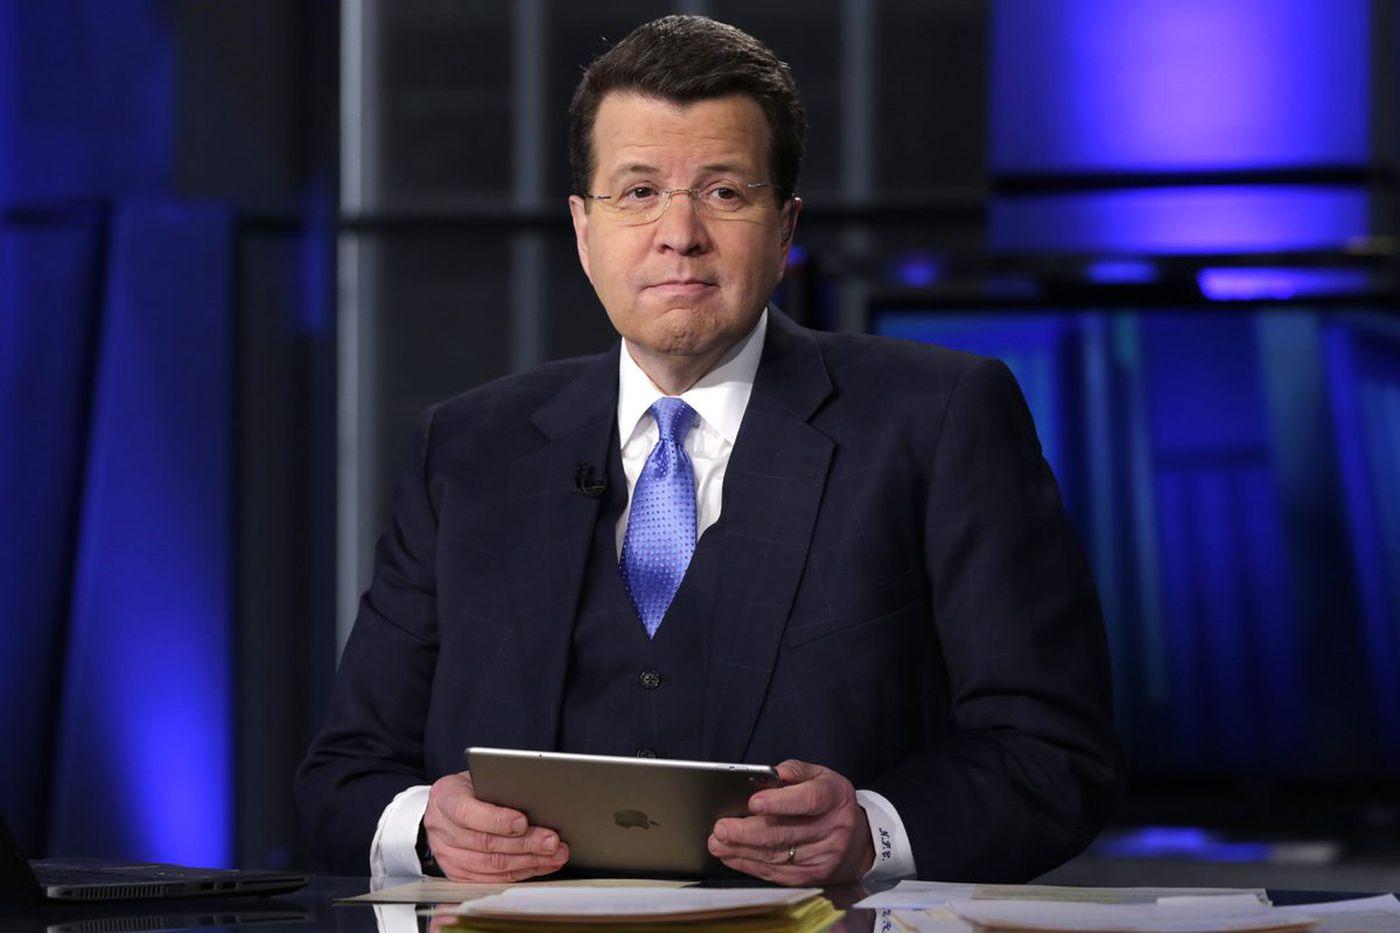 Fox News host Neil Cavuto blasts Trump for 4 straight minutes